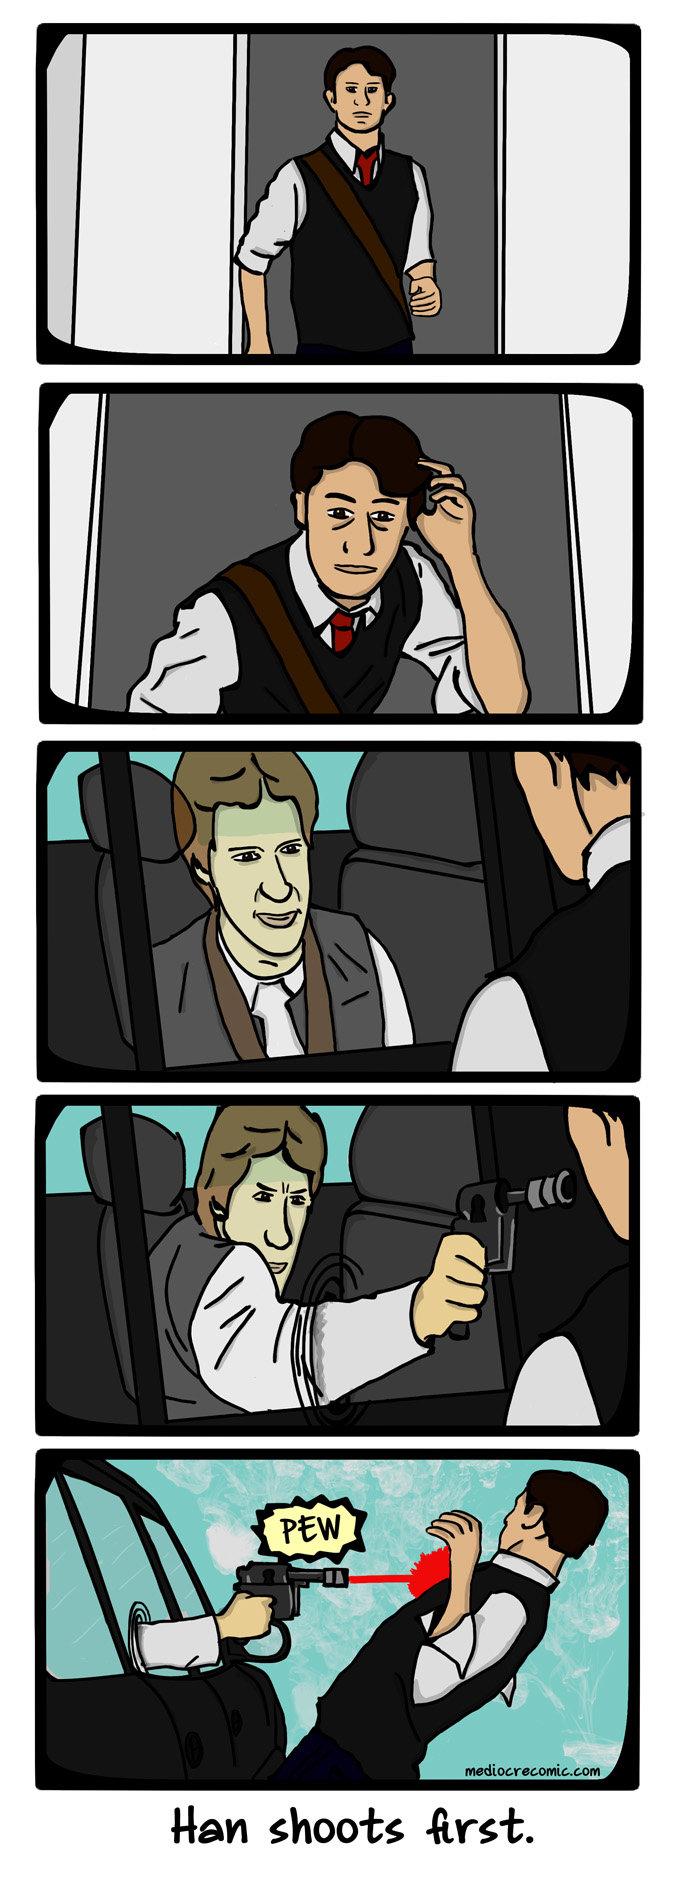 500 Days of Summer Han Solo Ending. . days of summer han solo star wars Movie comic joke Absurd WTF